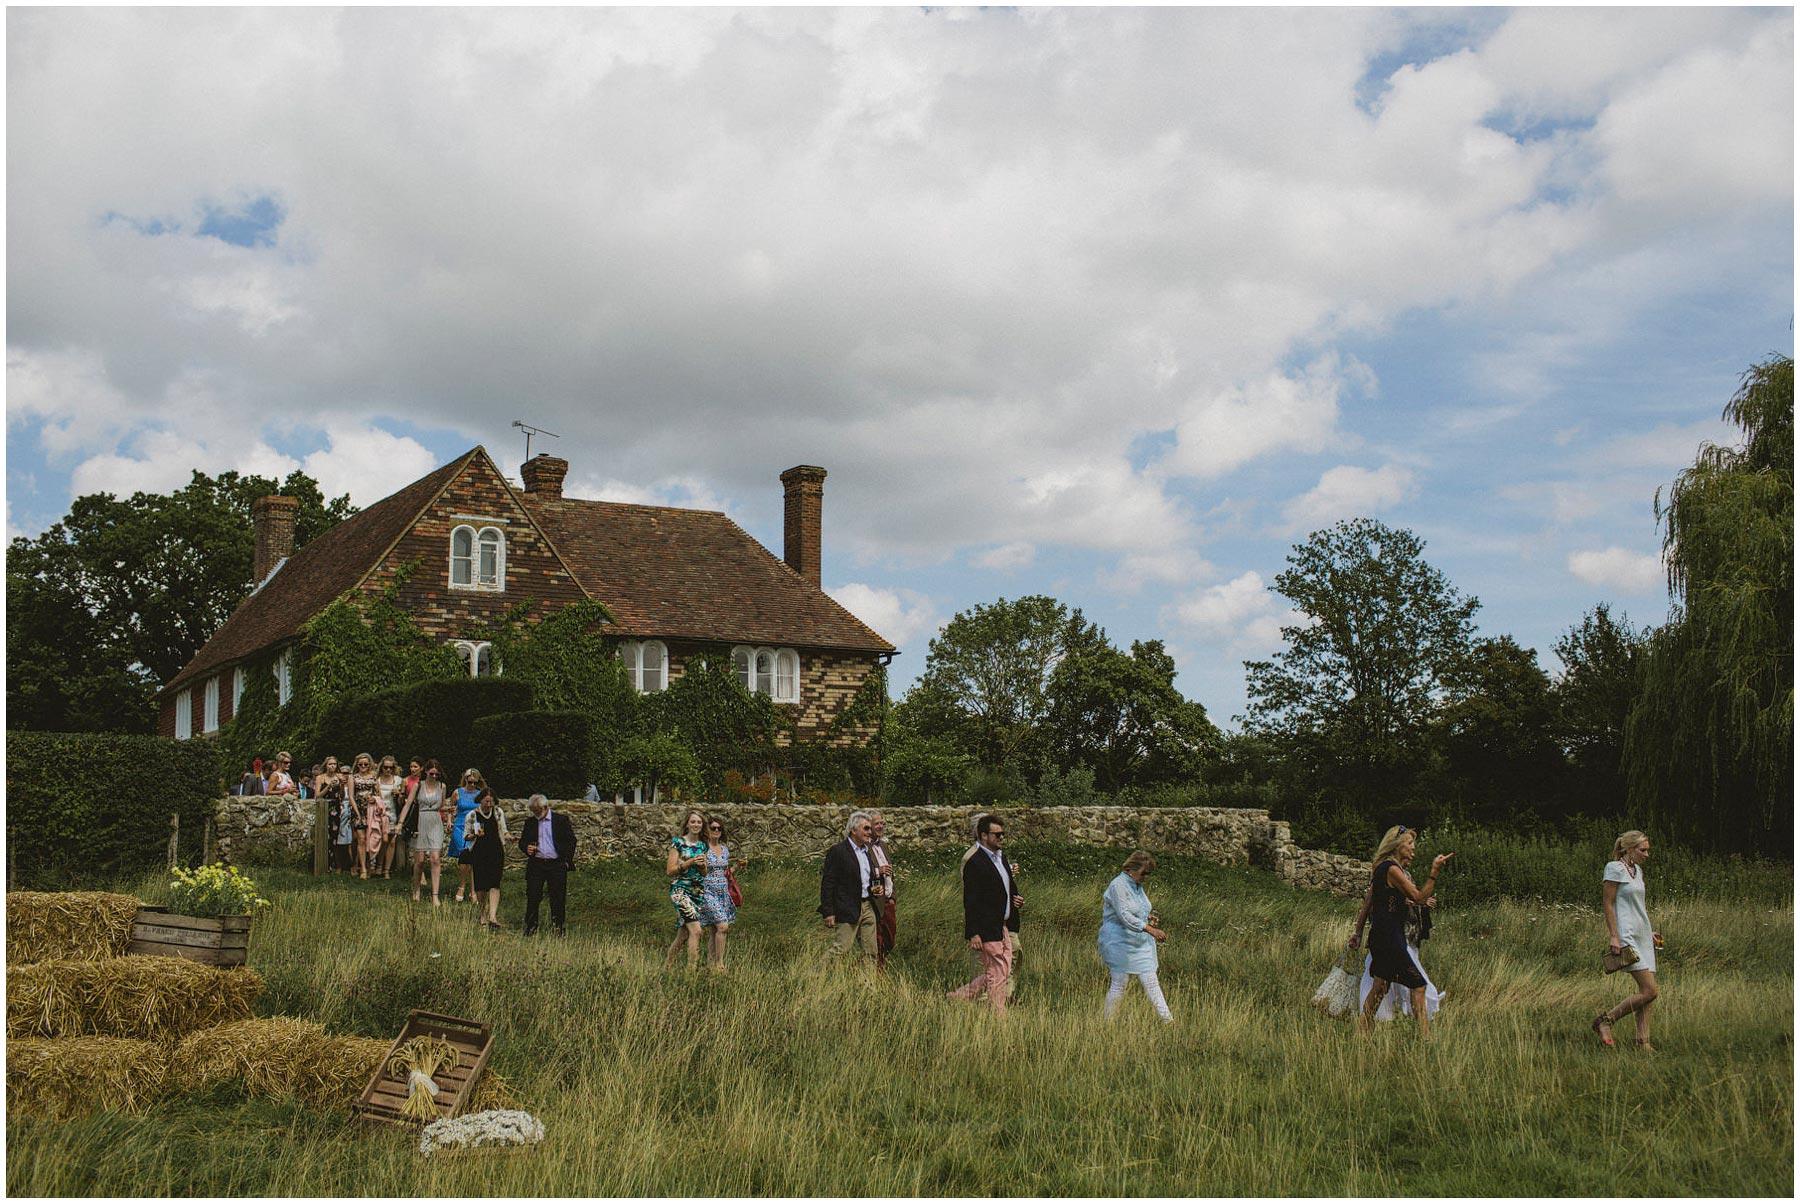 Kent-Festival-Tipi-wedding-photography_0049